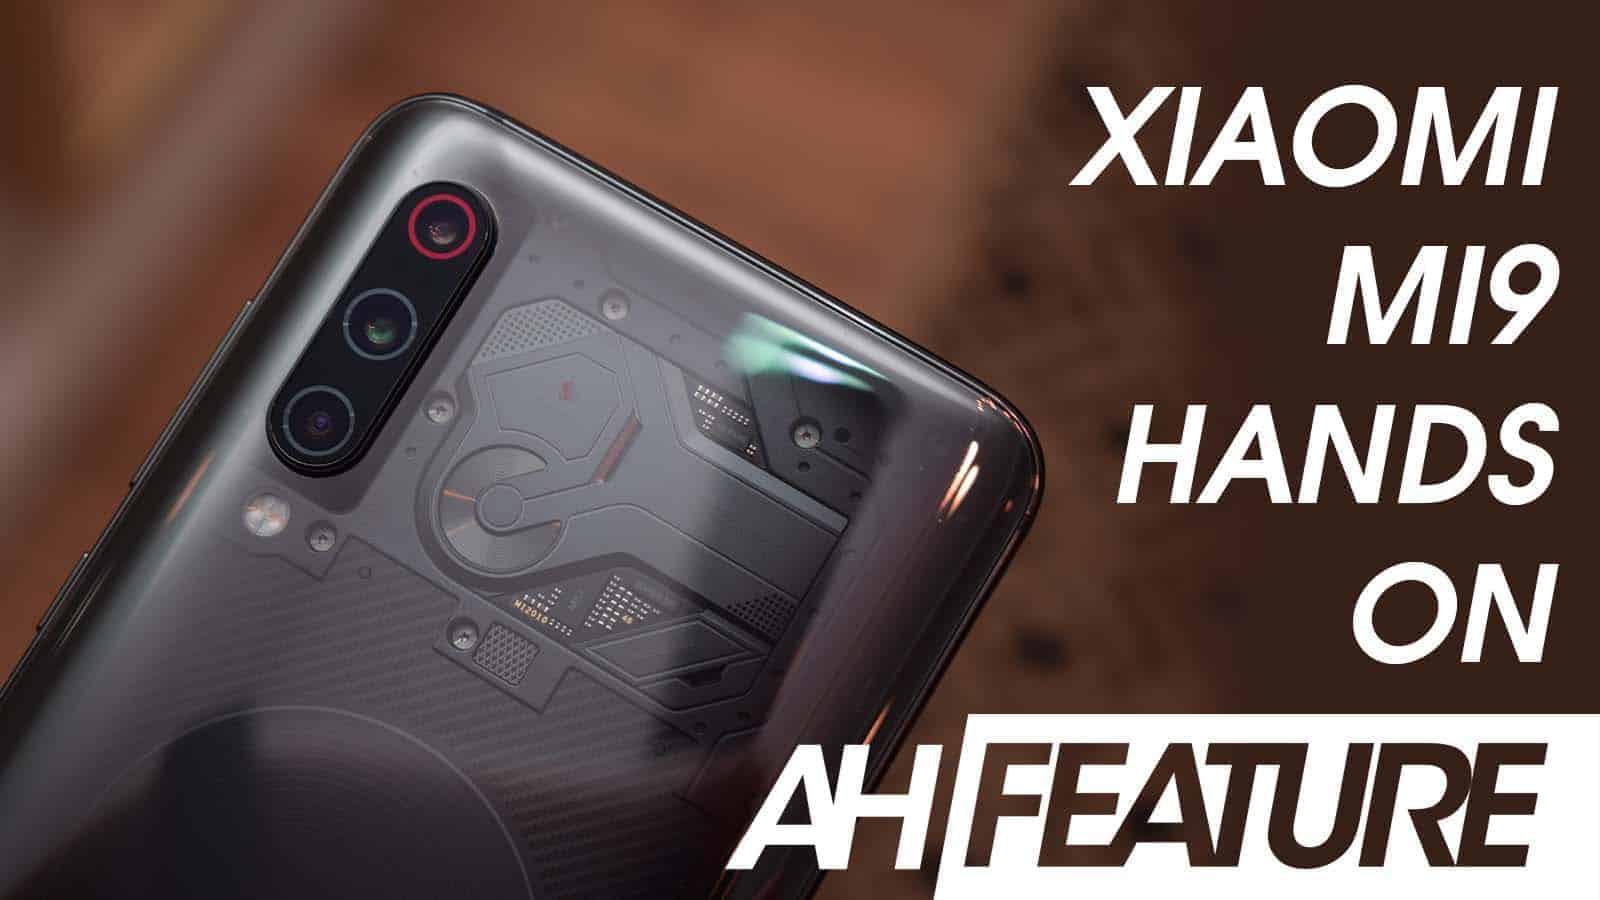 Xiaomi Mi 9 Hands On